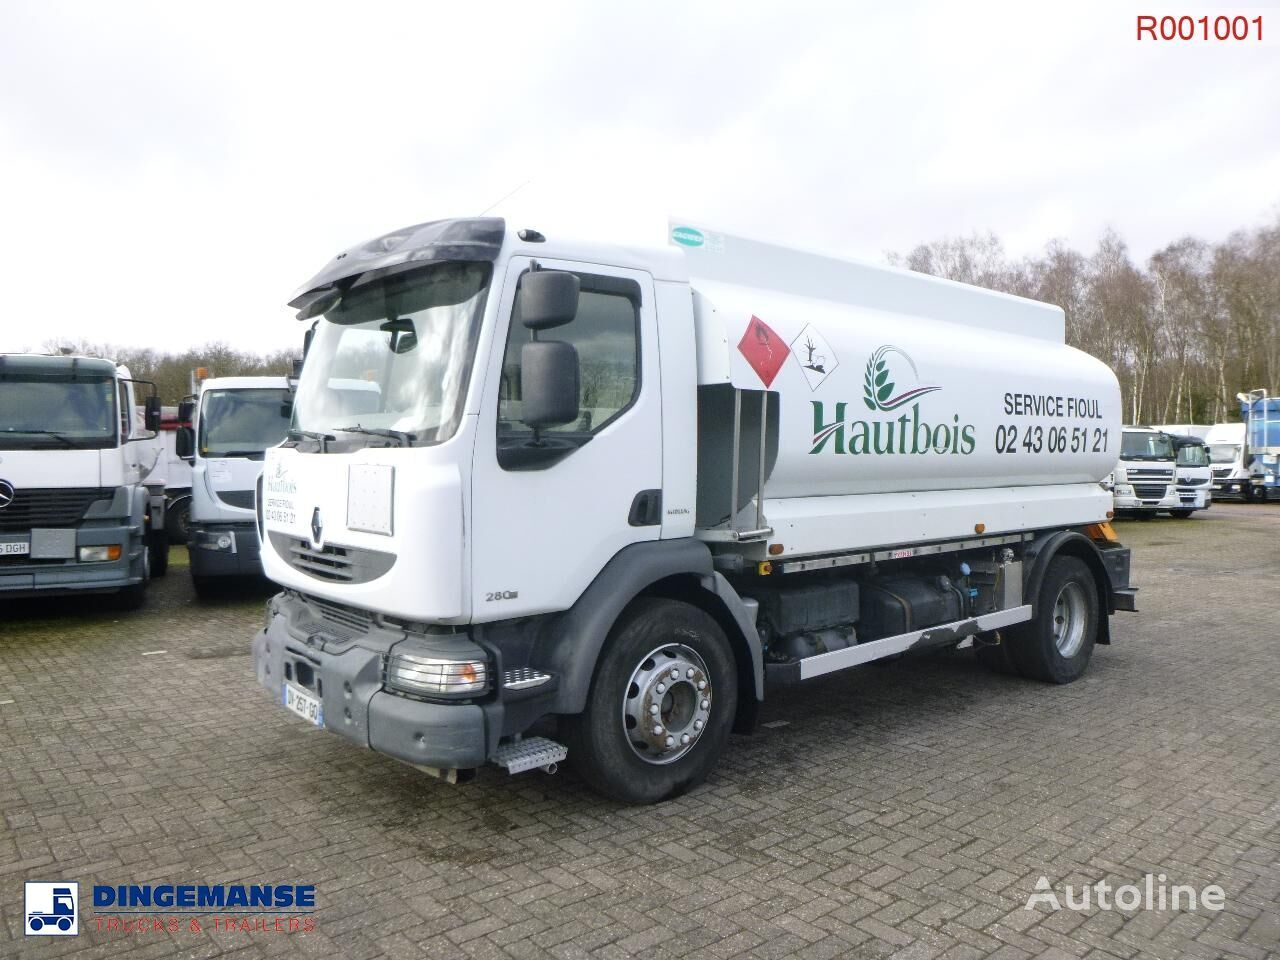 RENAULT Midlum 280 dxi 4x2 fuel tank 13.5 m3 / 4 comp camión de combustible